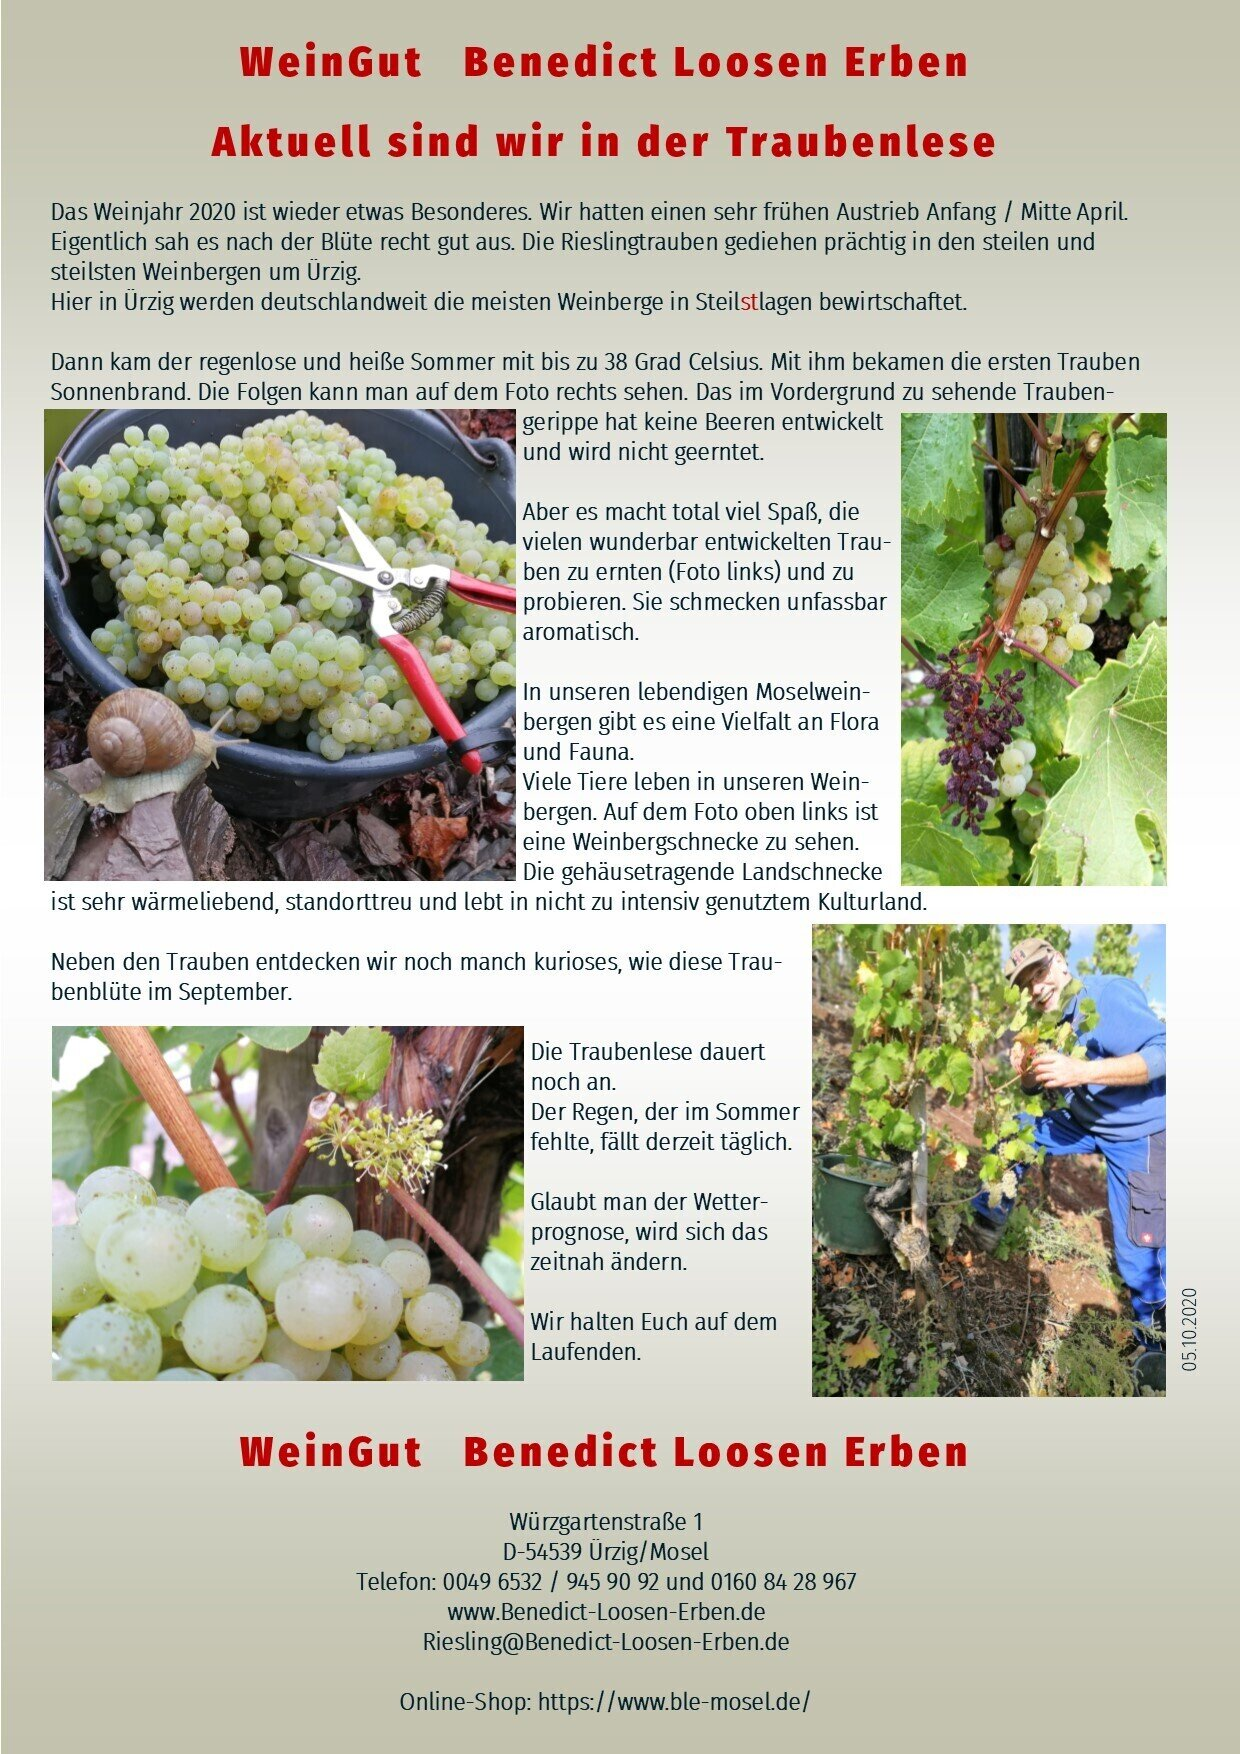 Neues aus dem WeinGut Benedict Loosen Erben